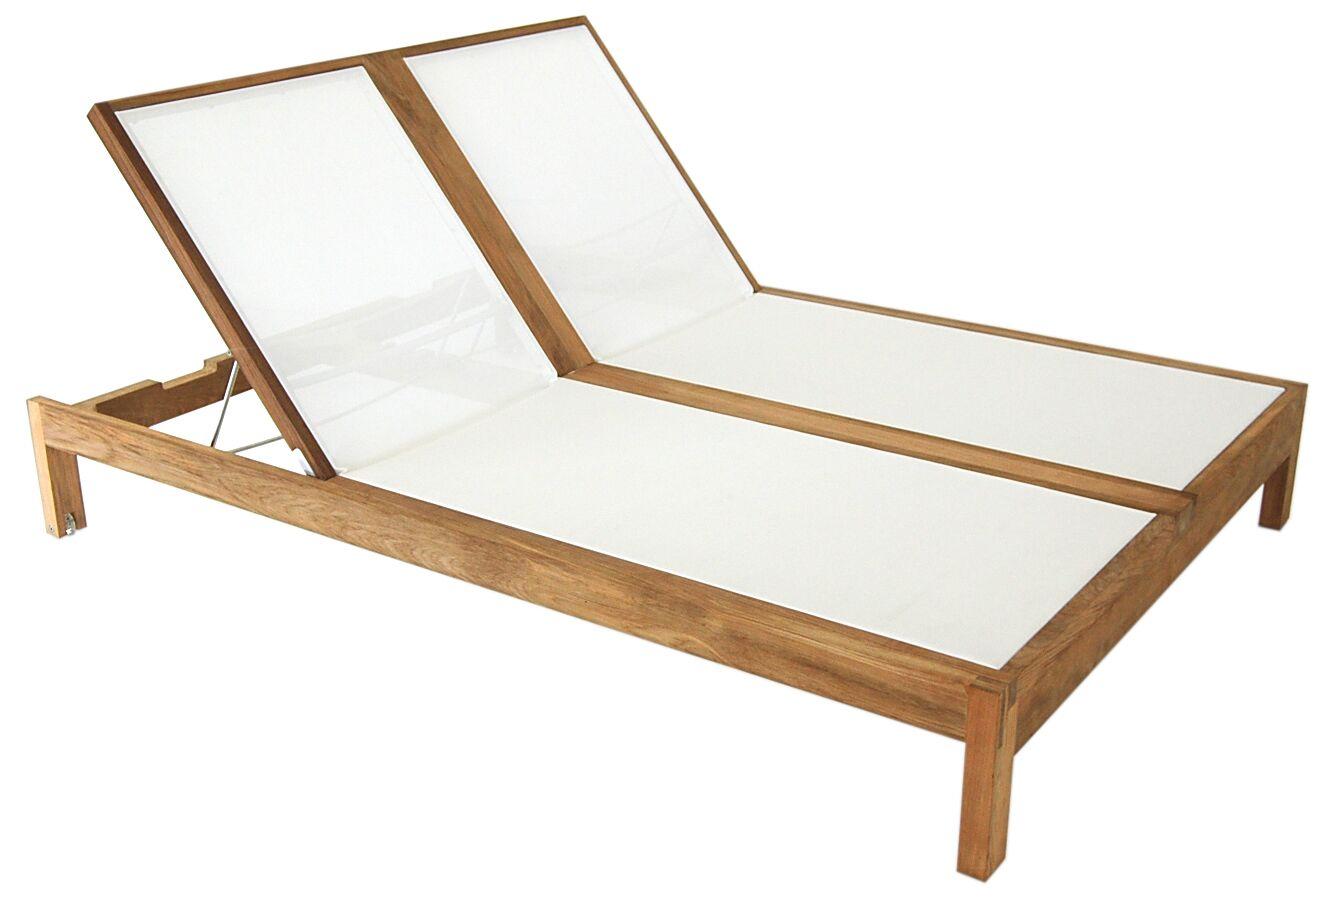 Hamilton Double Reclining Teak Chaise Lounge Fabric: White